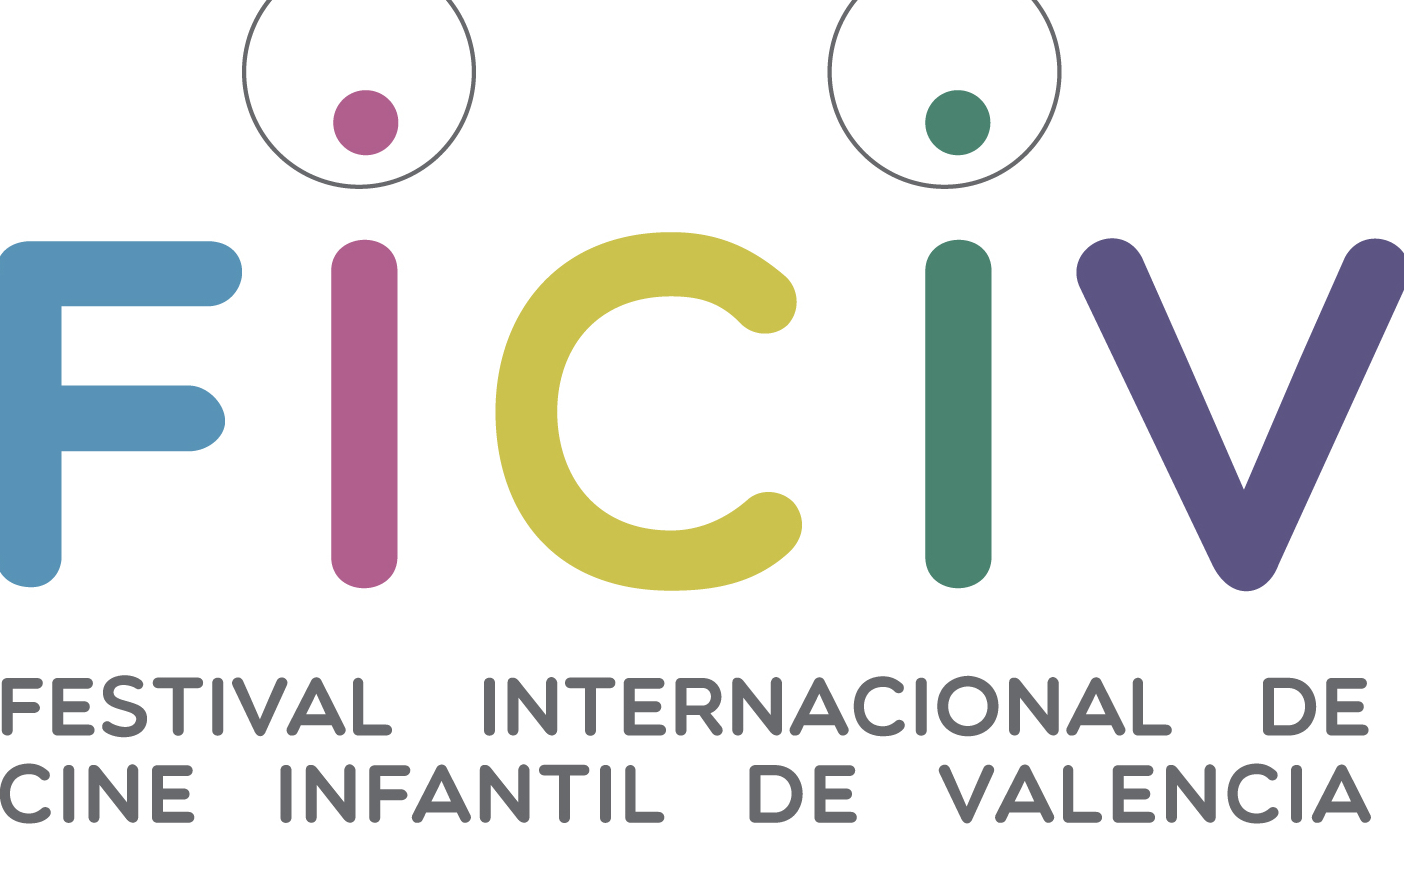 Festival Internacional de Cine Infantil de Valencia - FICIV